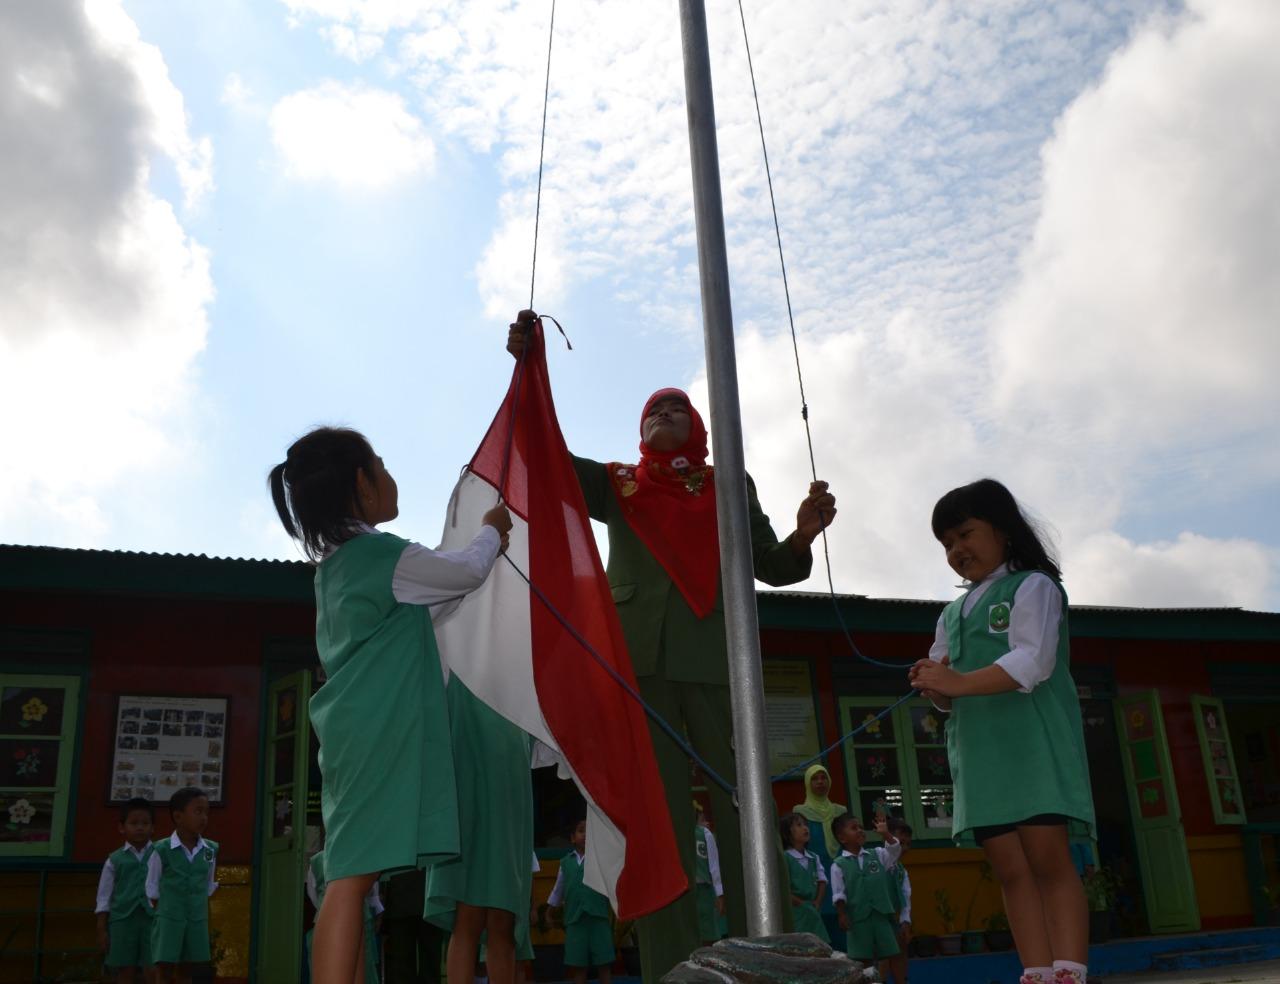 Mendidik Budi Pekerti dengan Mewajibkan Upacara Bendera di Sekolah